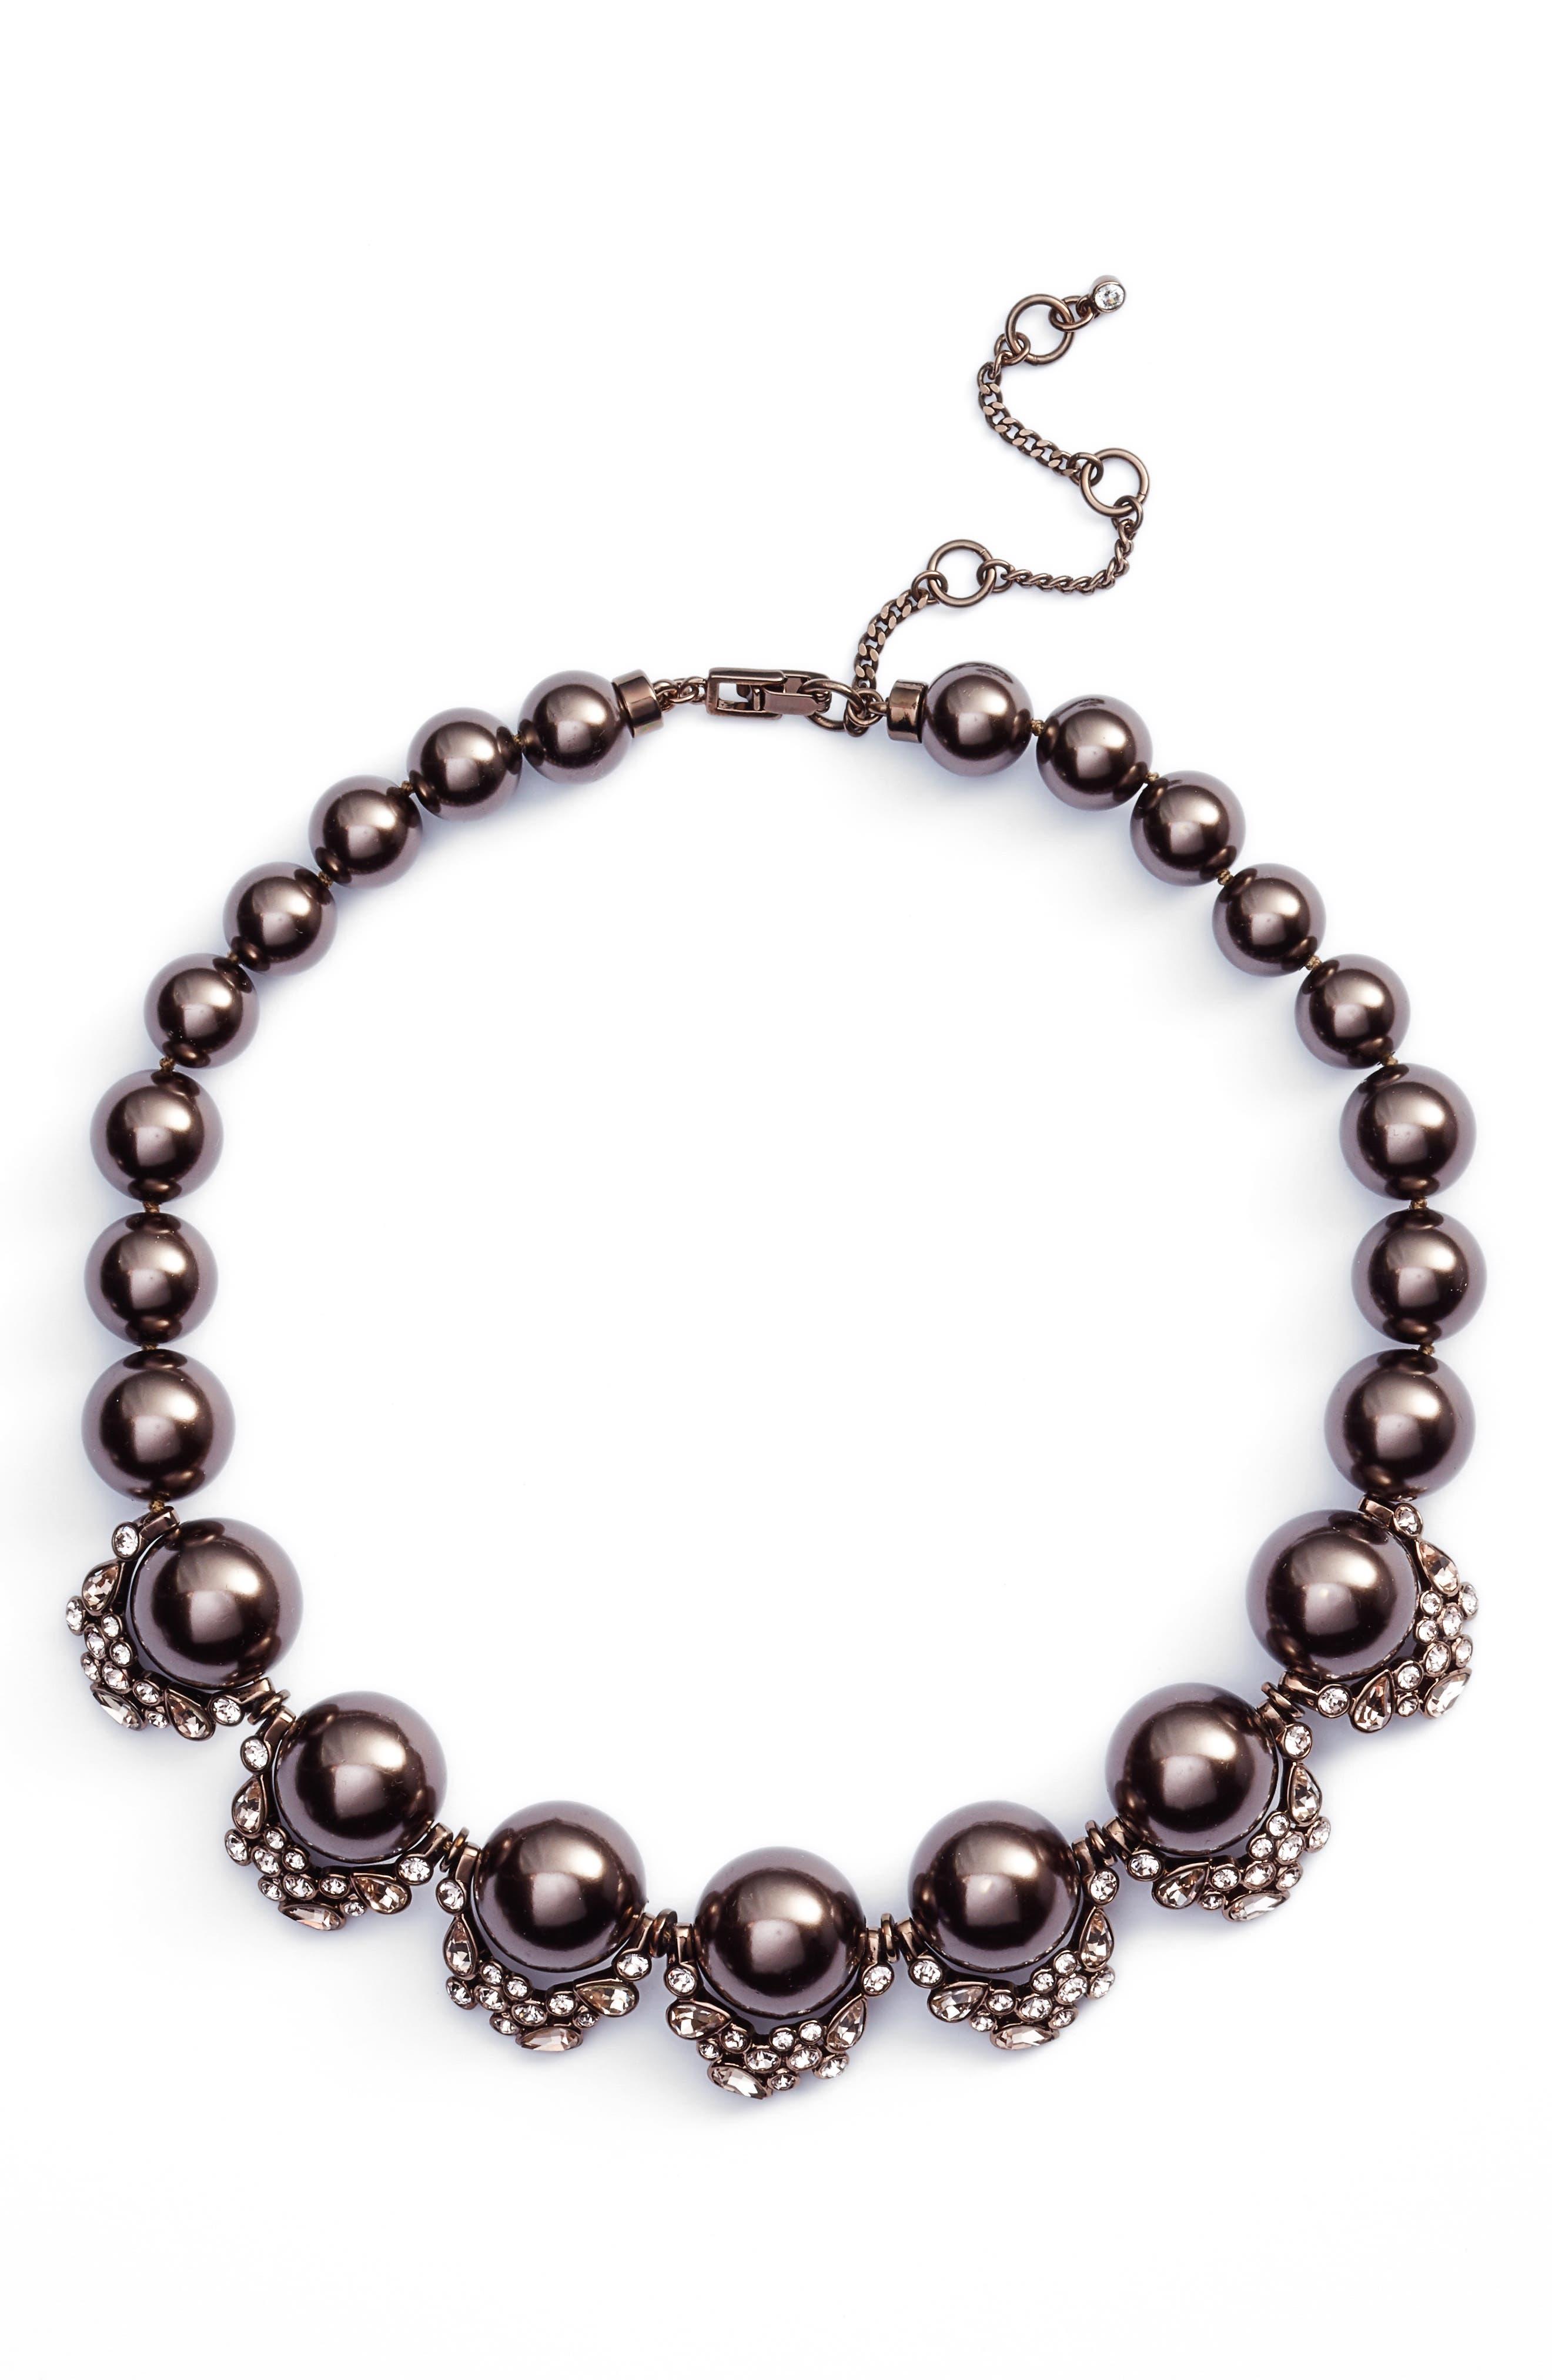 Imitation Pearl & Crystal Collar Necklace,                             Main thumbnail 1, color,                             200